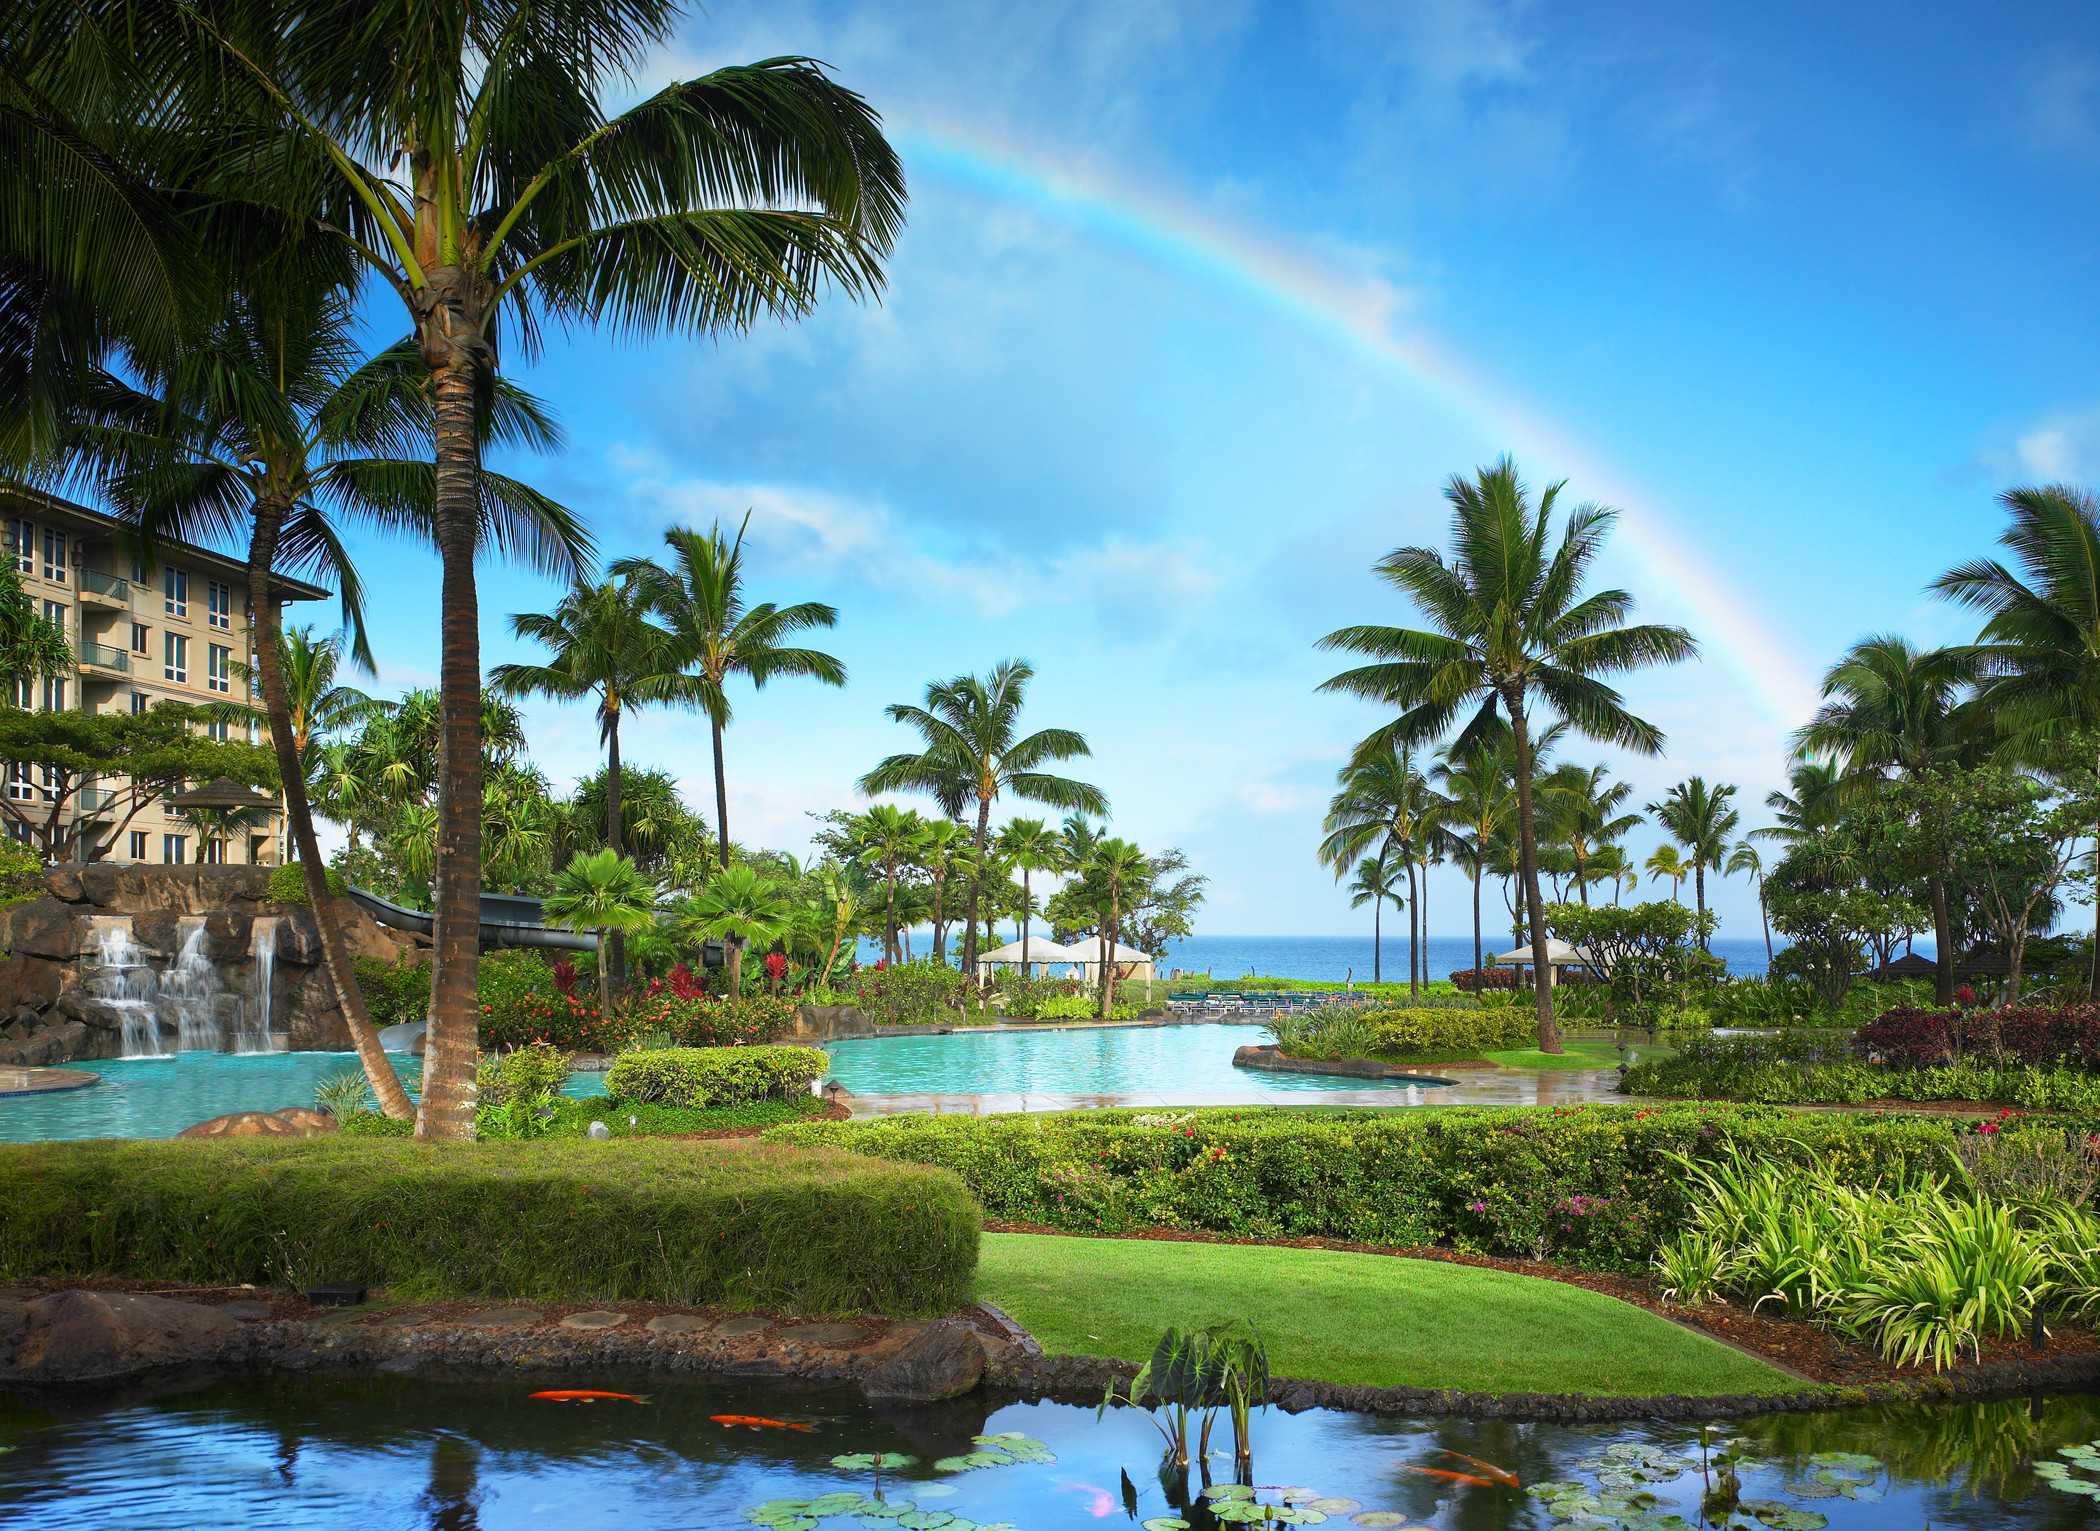 Maui Timeshare Resales and all Maui Timeshares